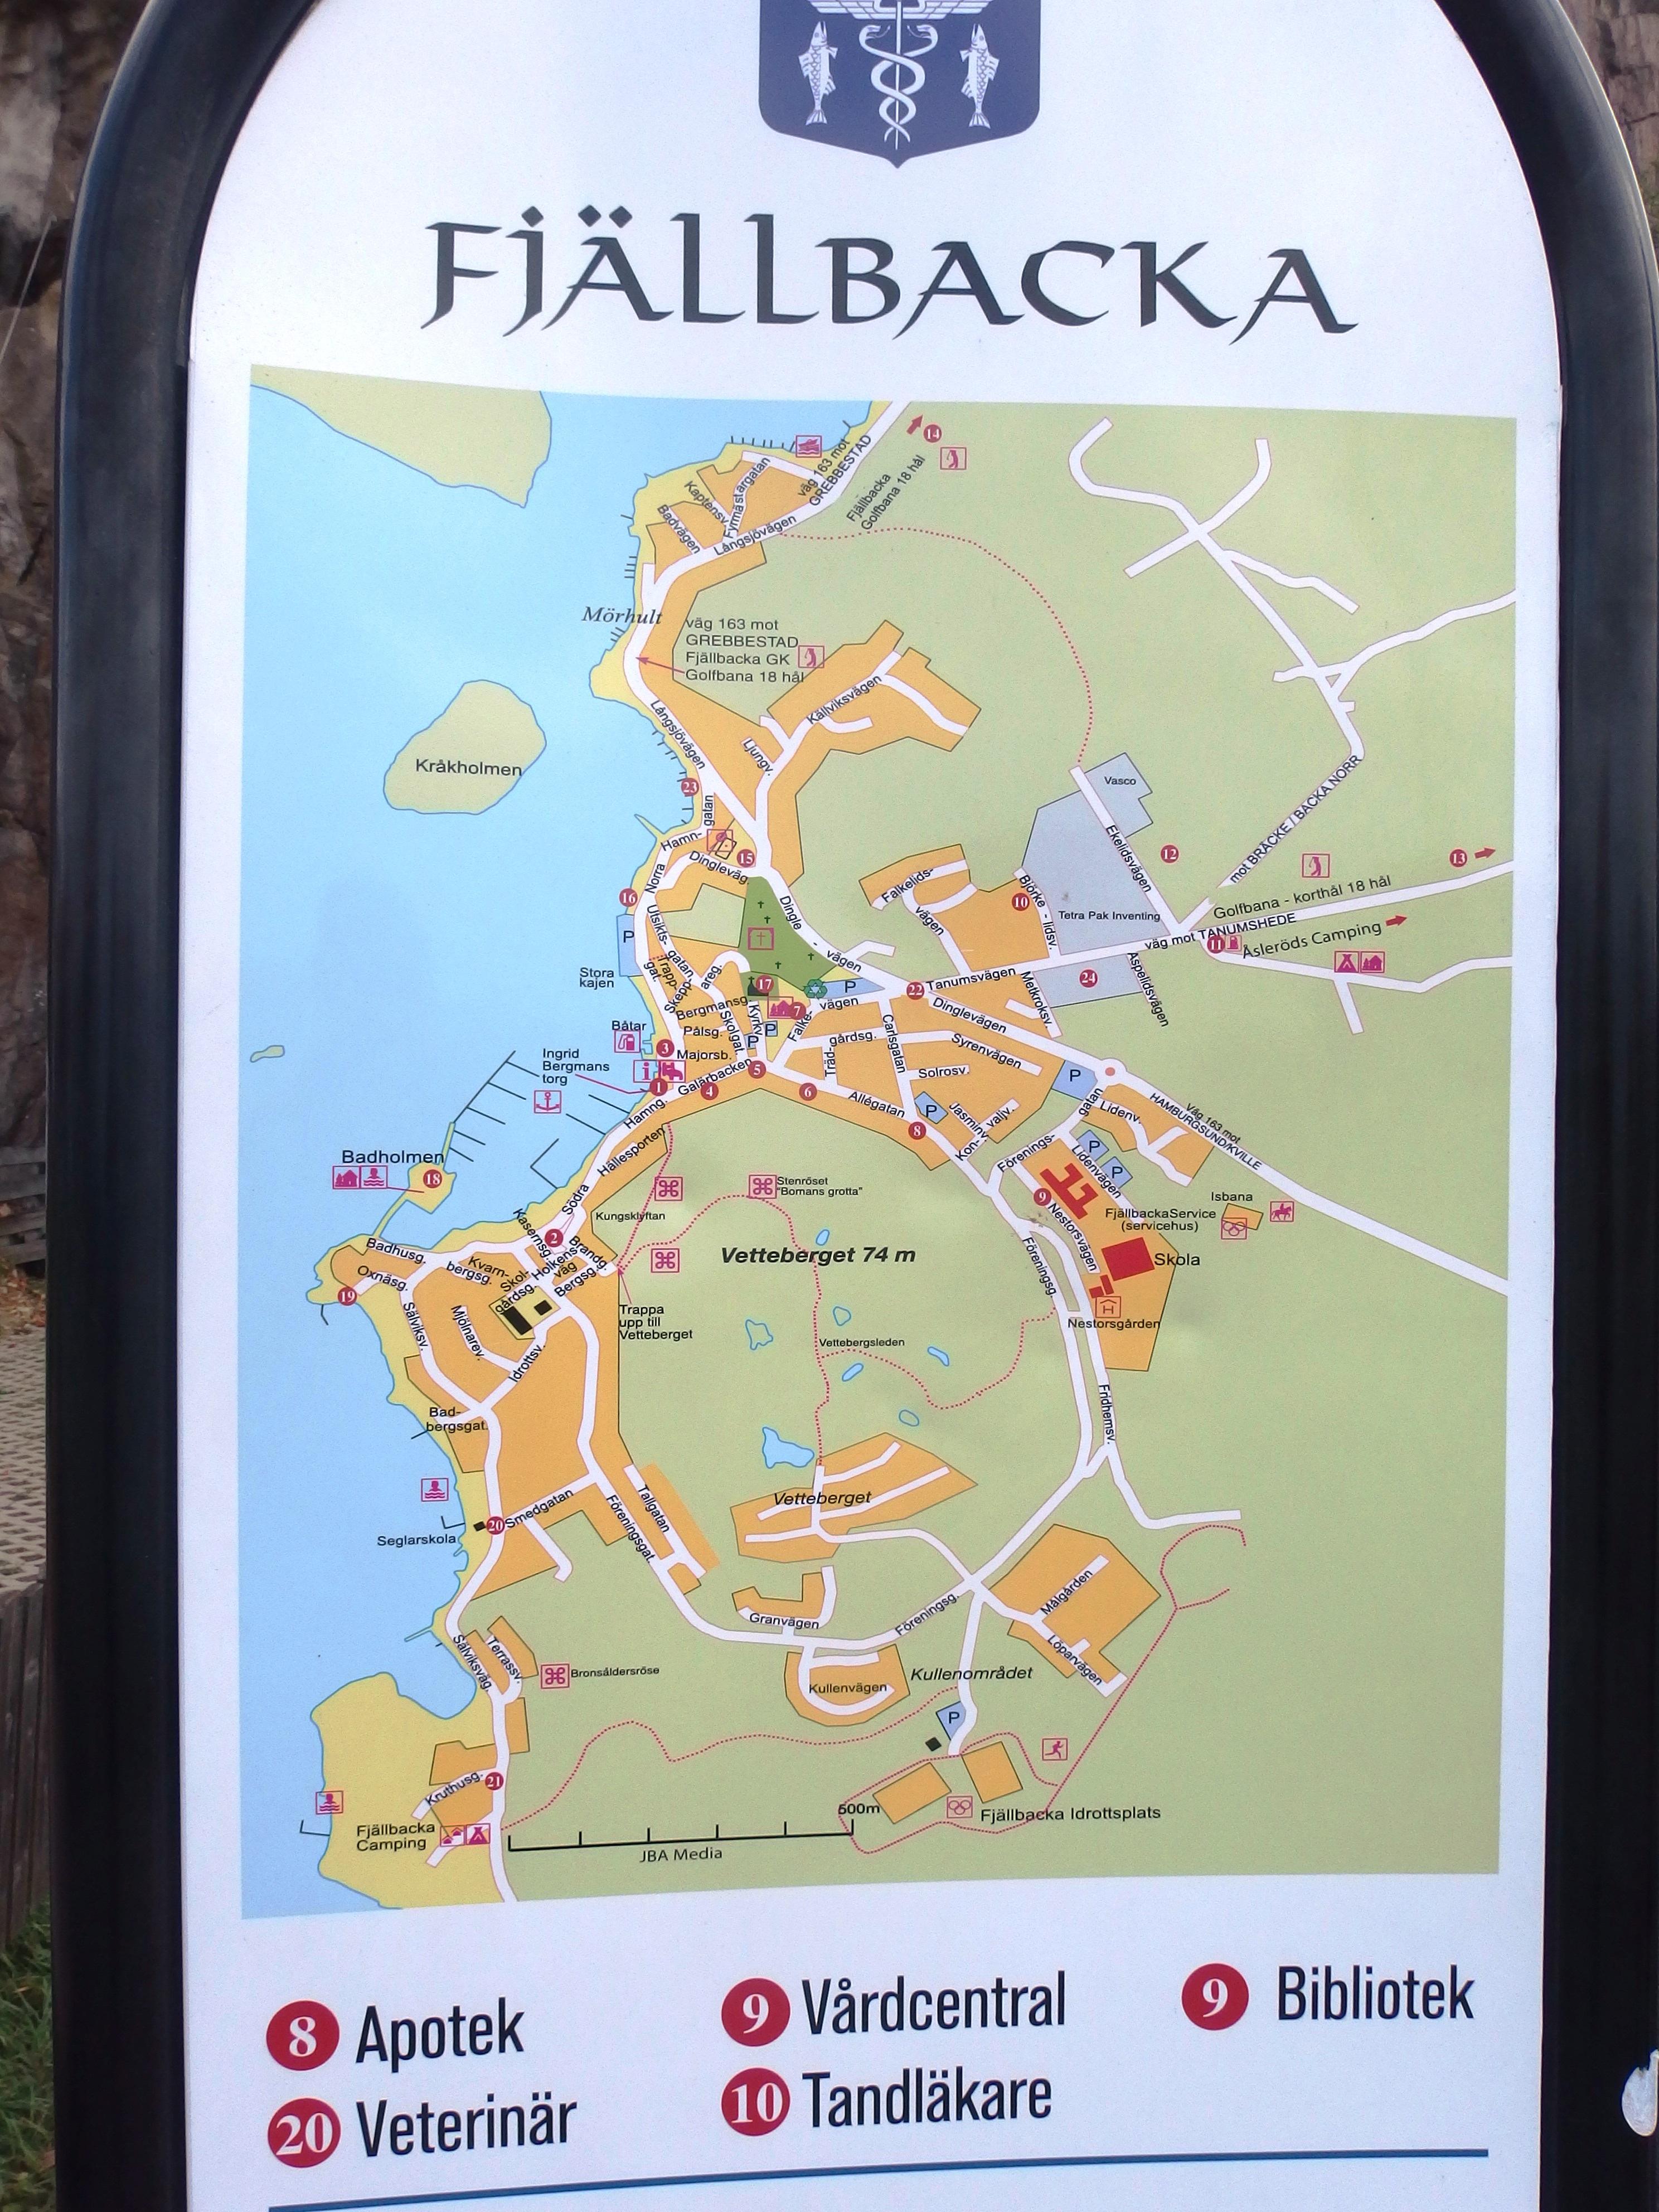 Bryggan Fjallbacka Hotel